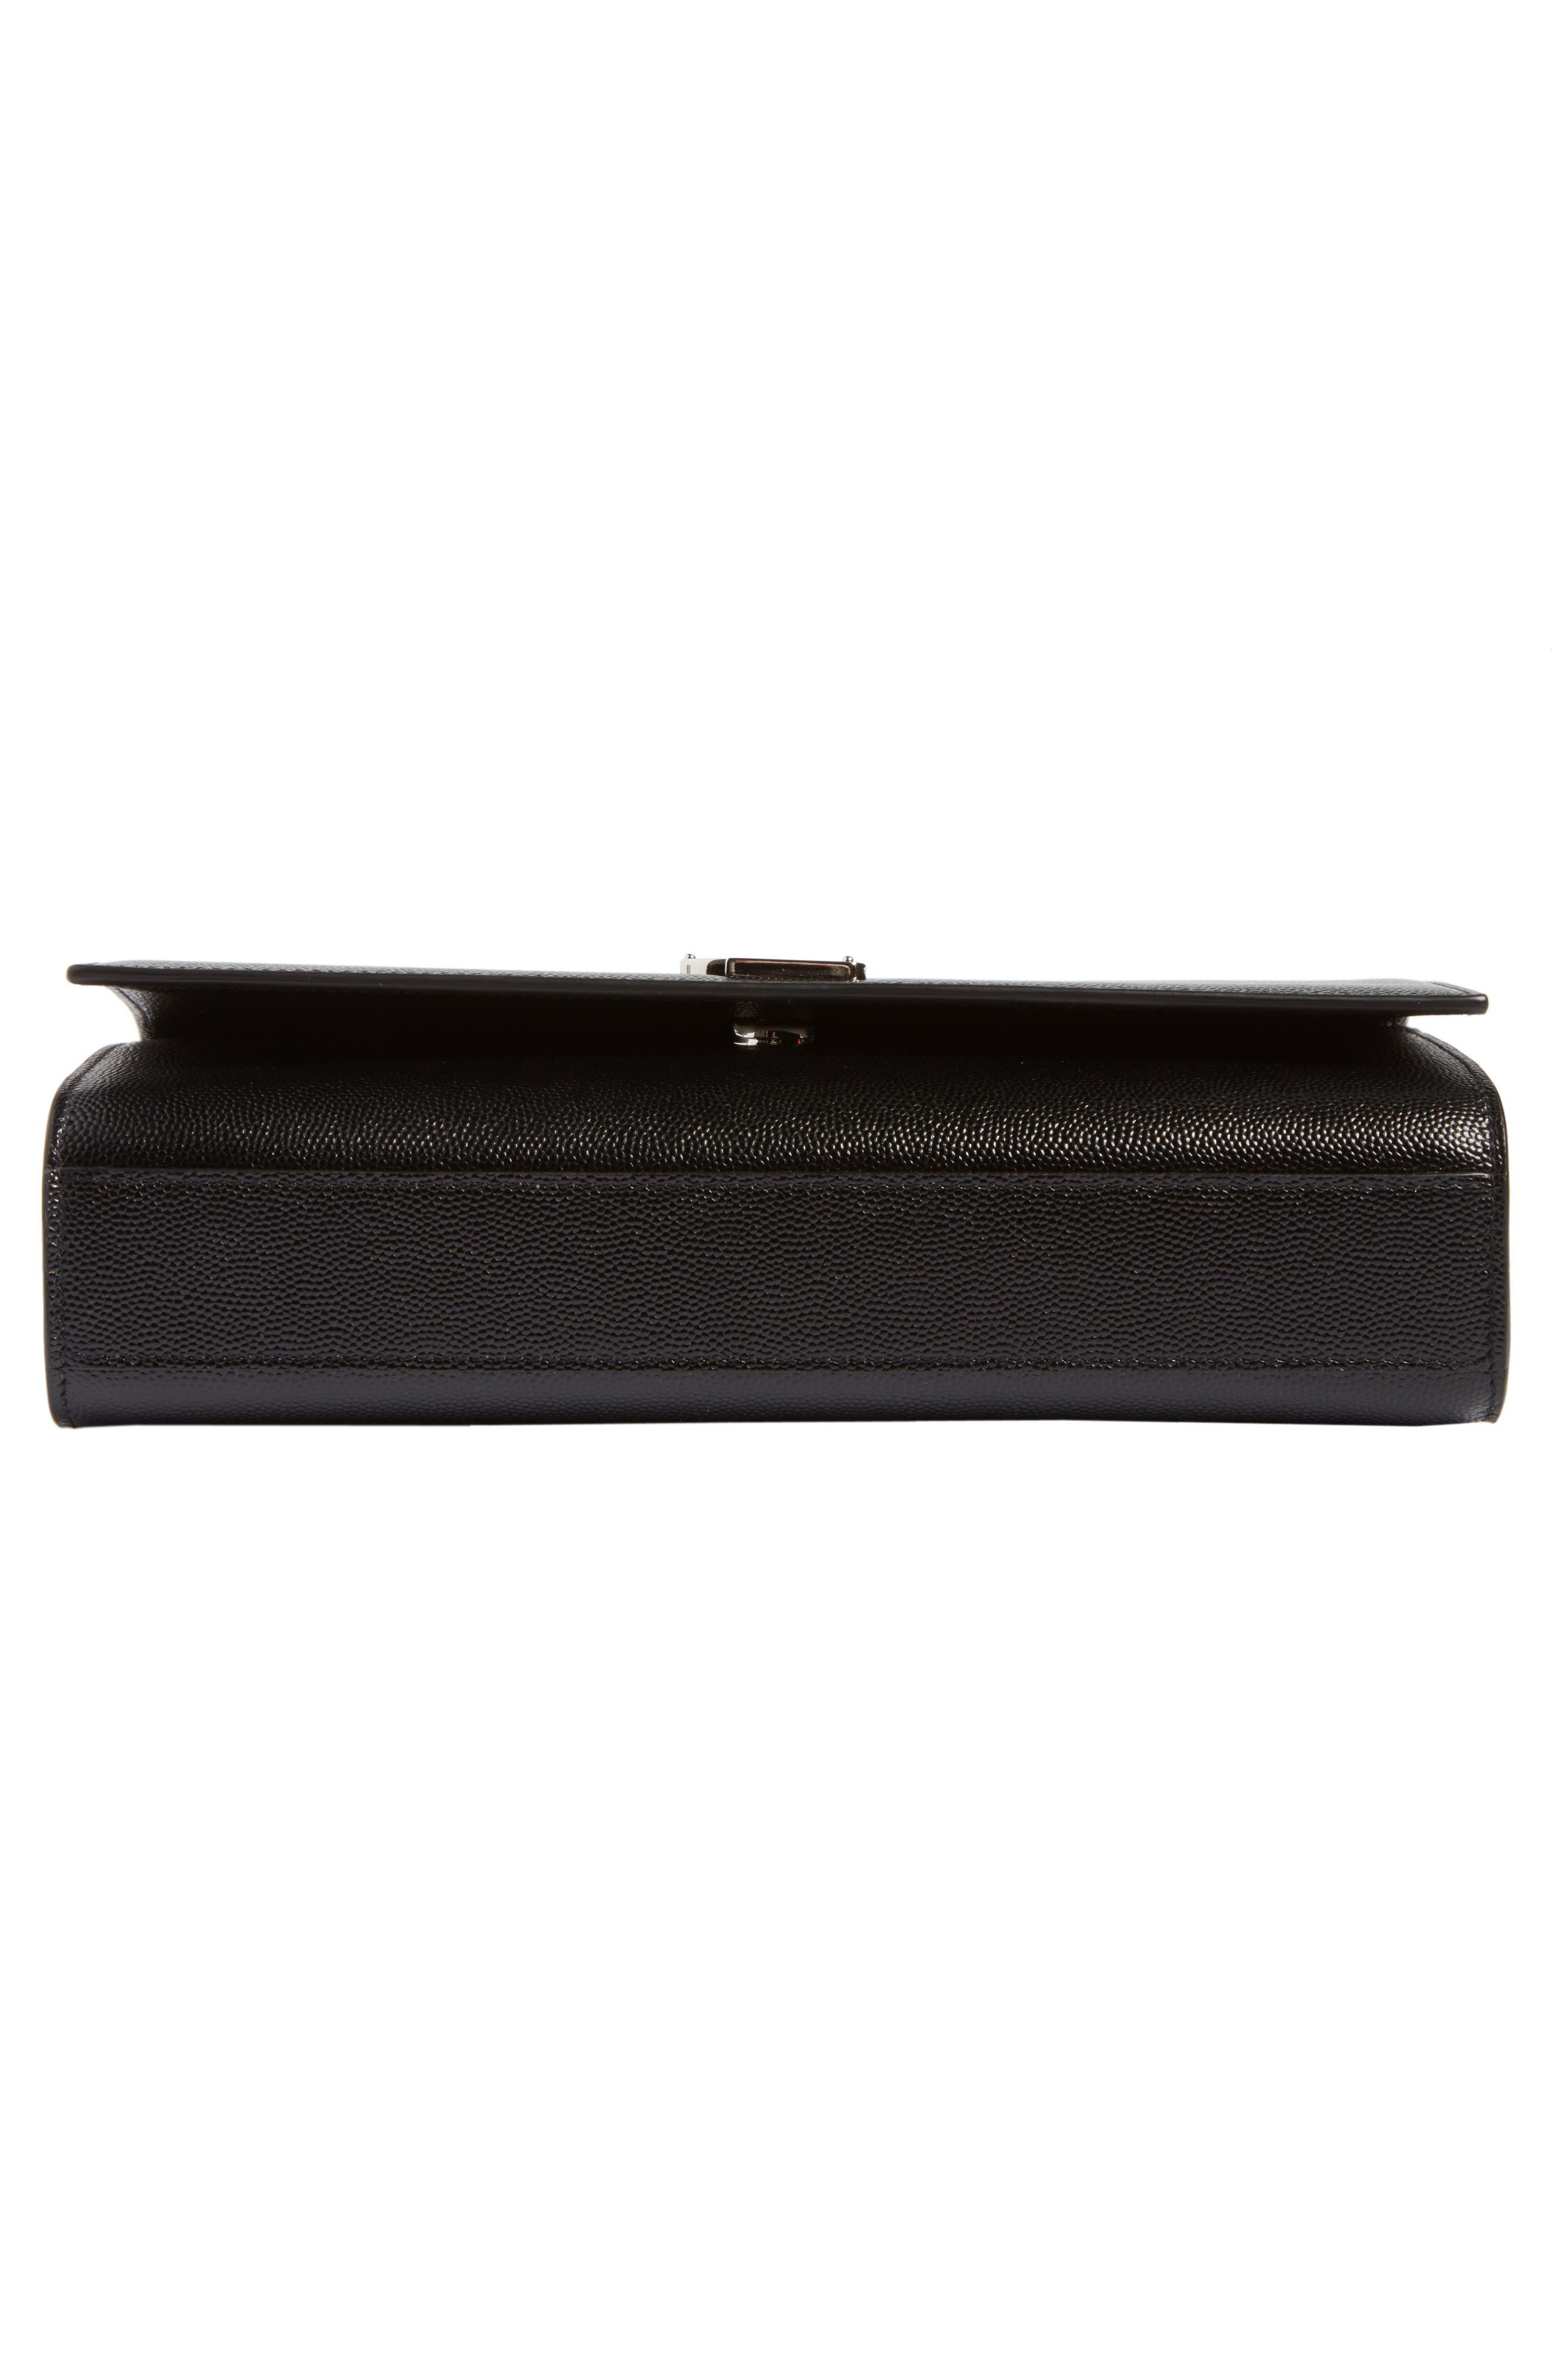 SAINT LAURENT, Medium Kate Calfskin Leather Shoulder Bag, Alternate thumbnail 6, color, NERO